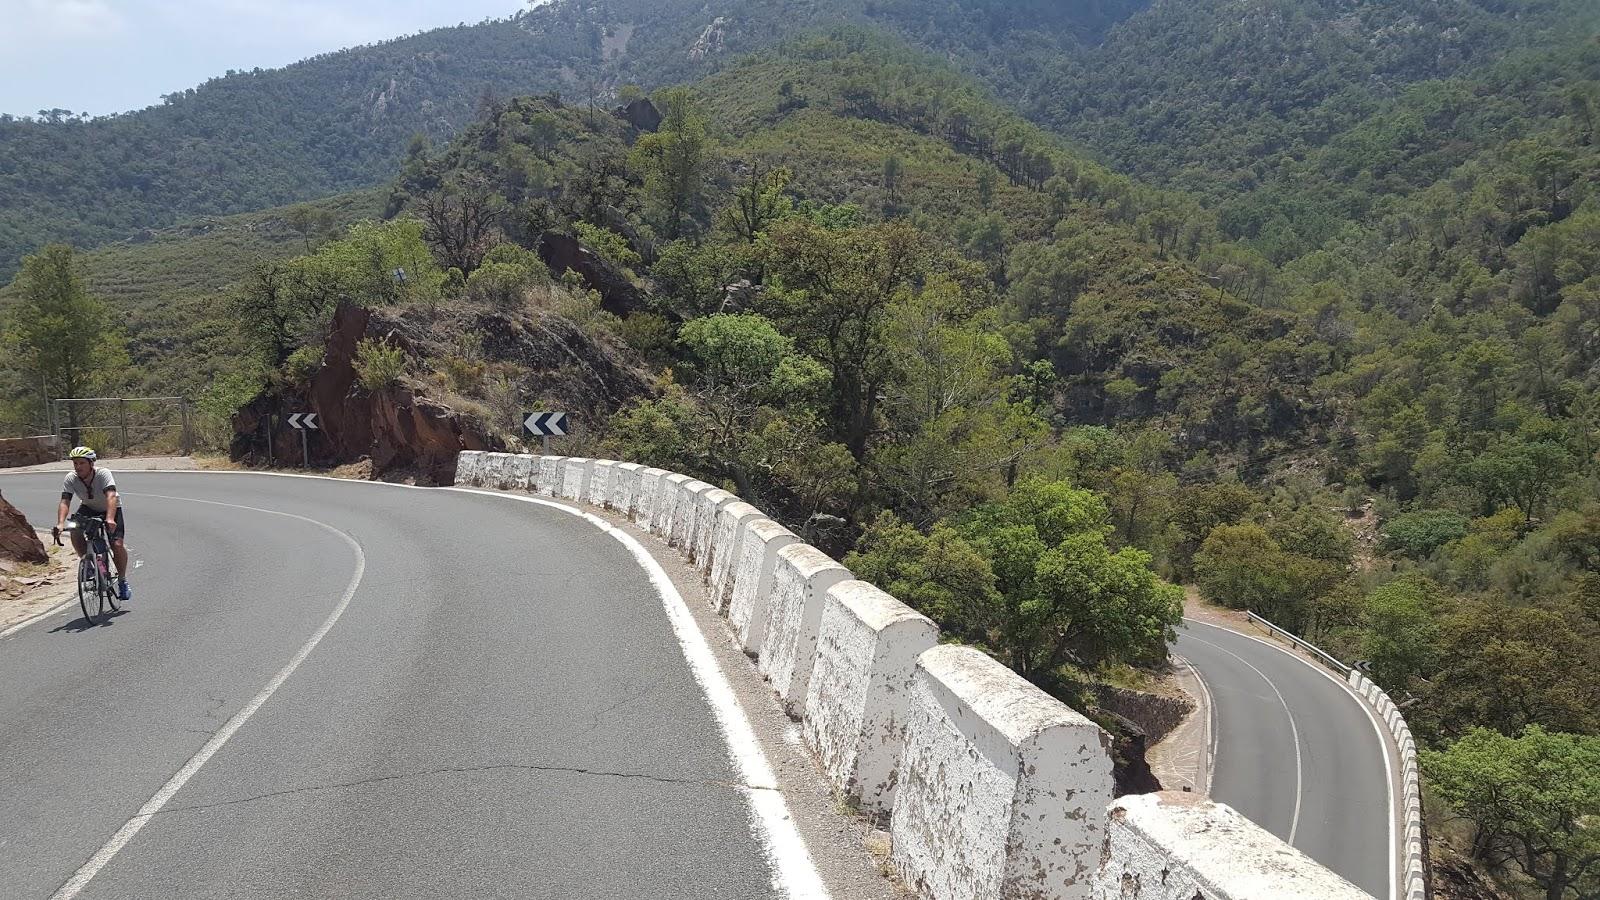 Bike riding in Sierra Calderona, province of Valencia, Spain